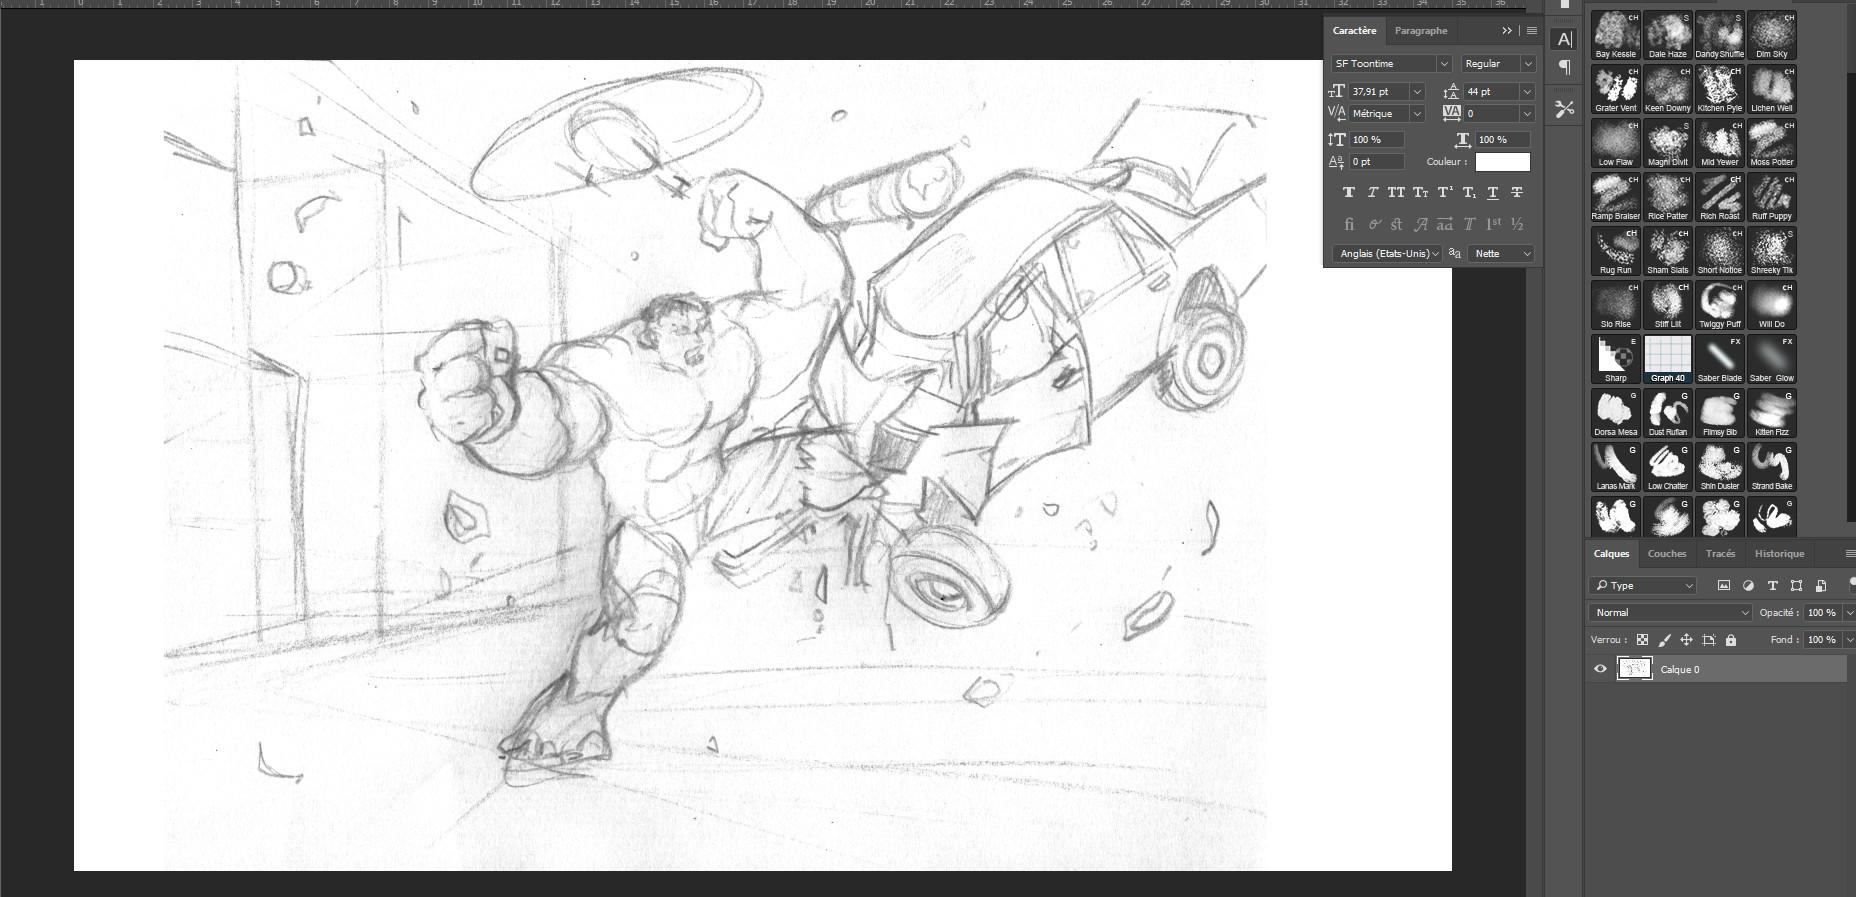 Serge fiedos 02 sketch hulk beamng by serge fiedos